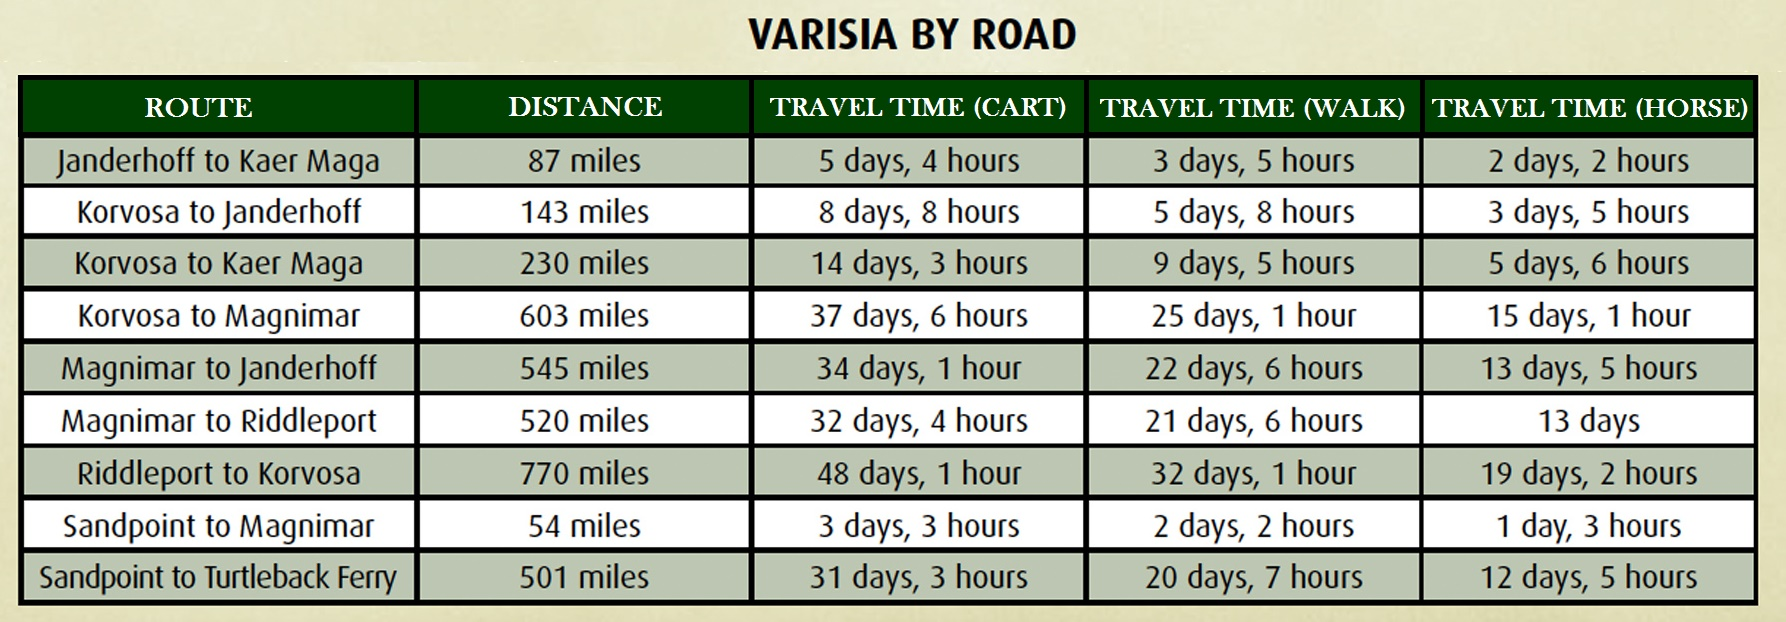 Varisia_travel_times.jpg